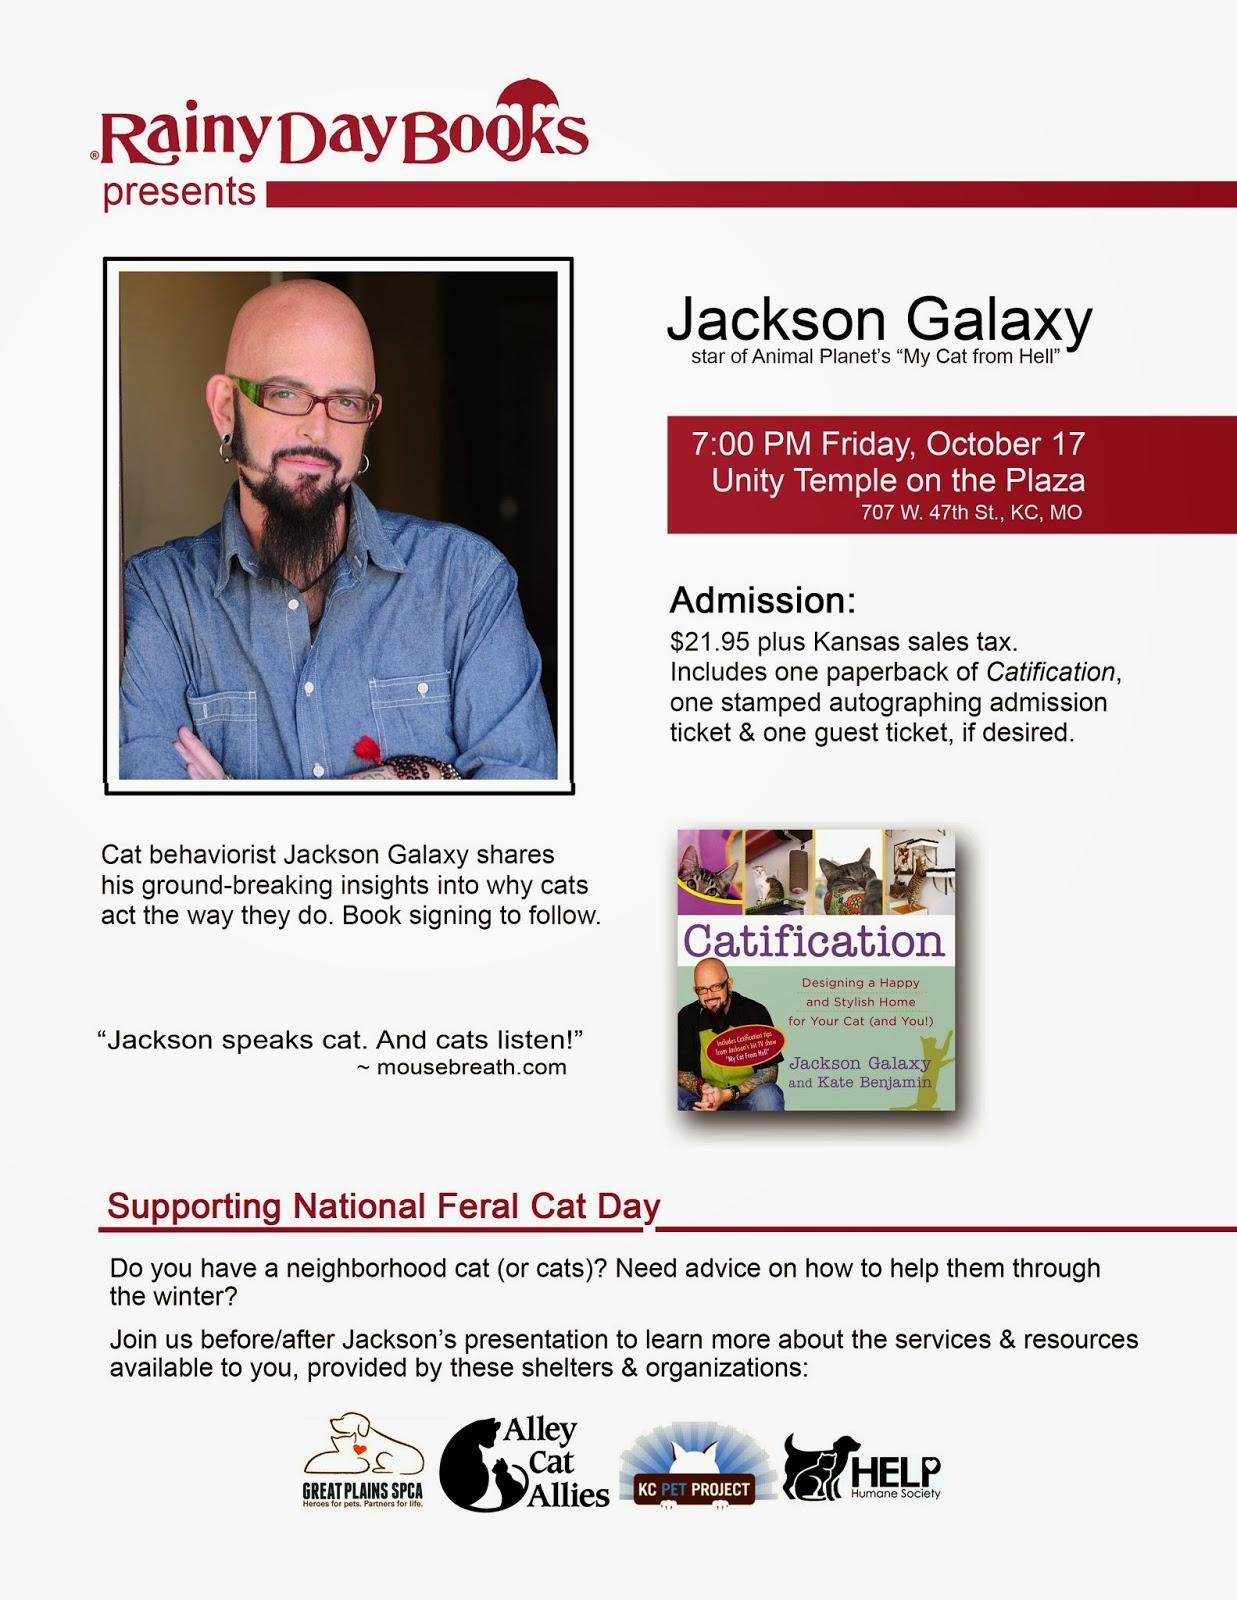 http://rainydaybooks.com/JacksonGalaxy